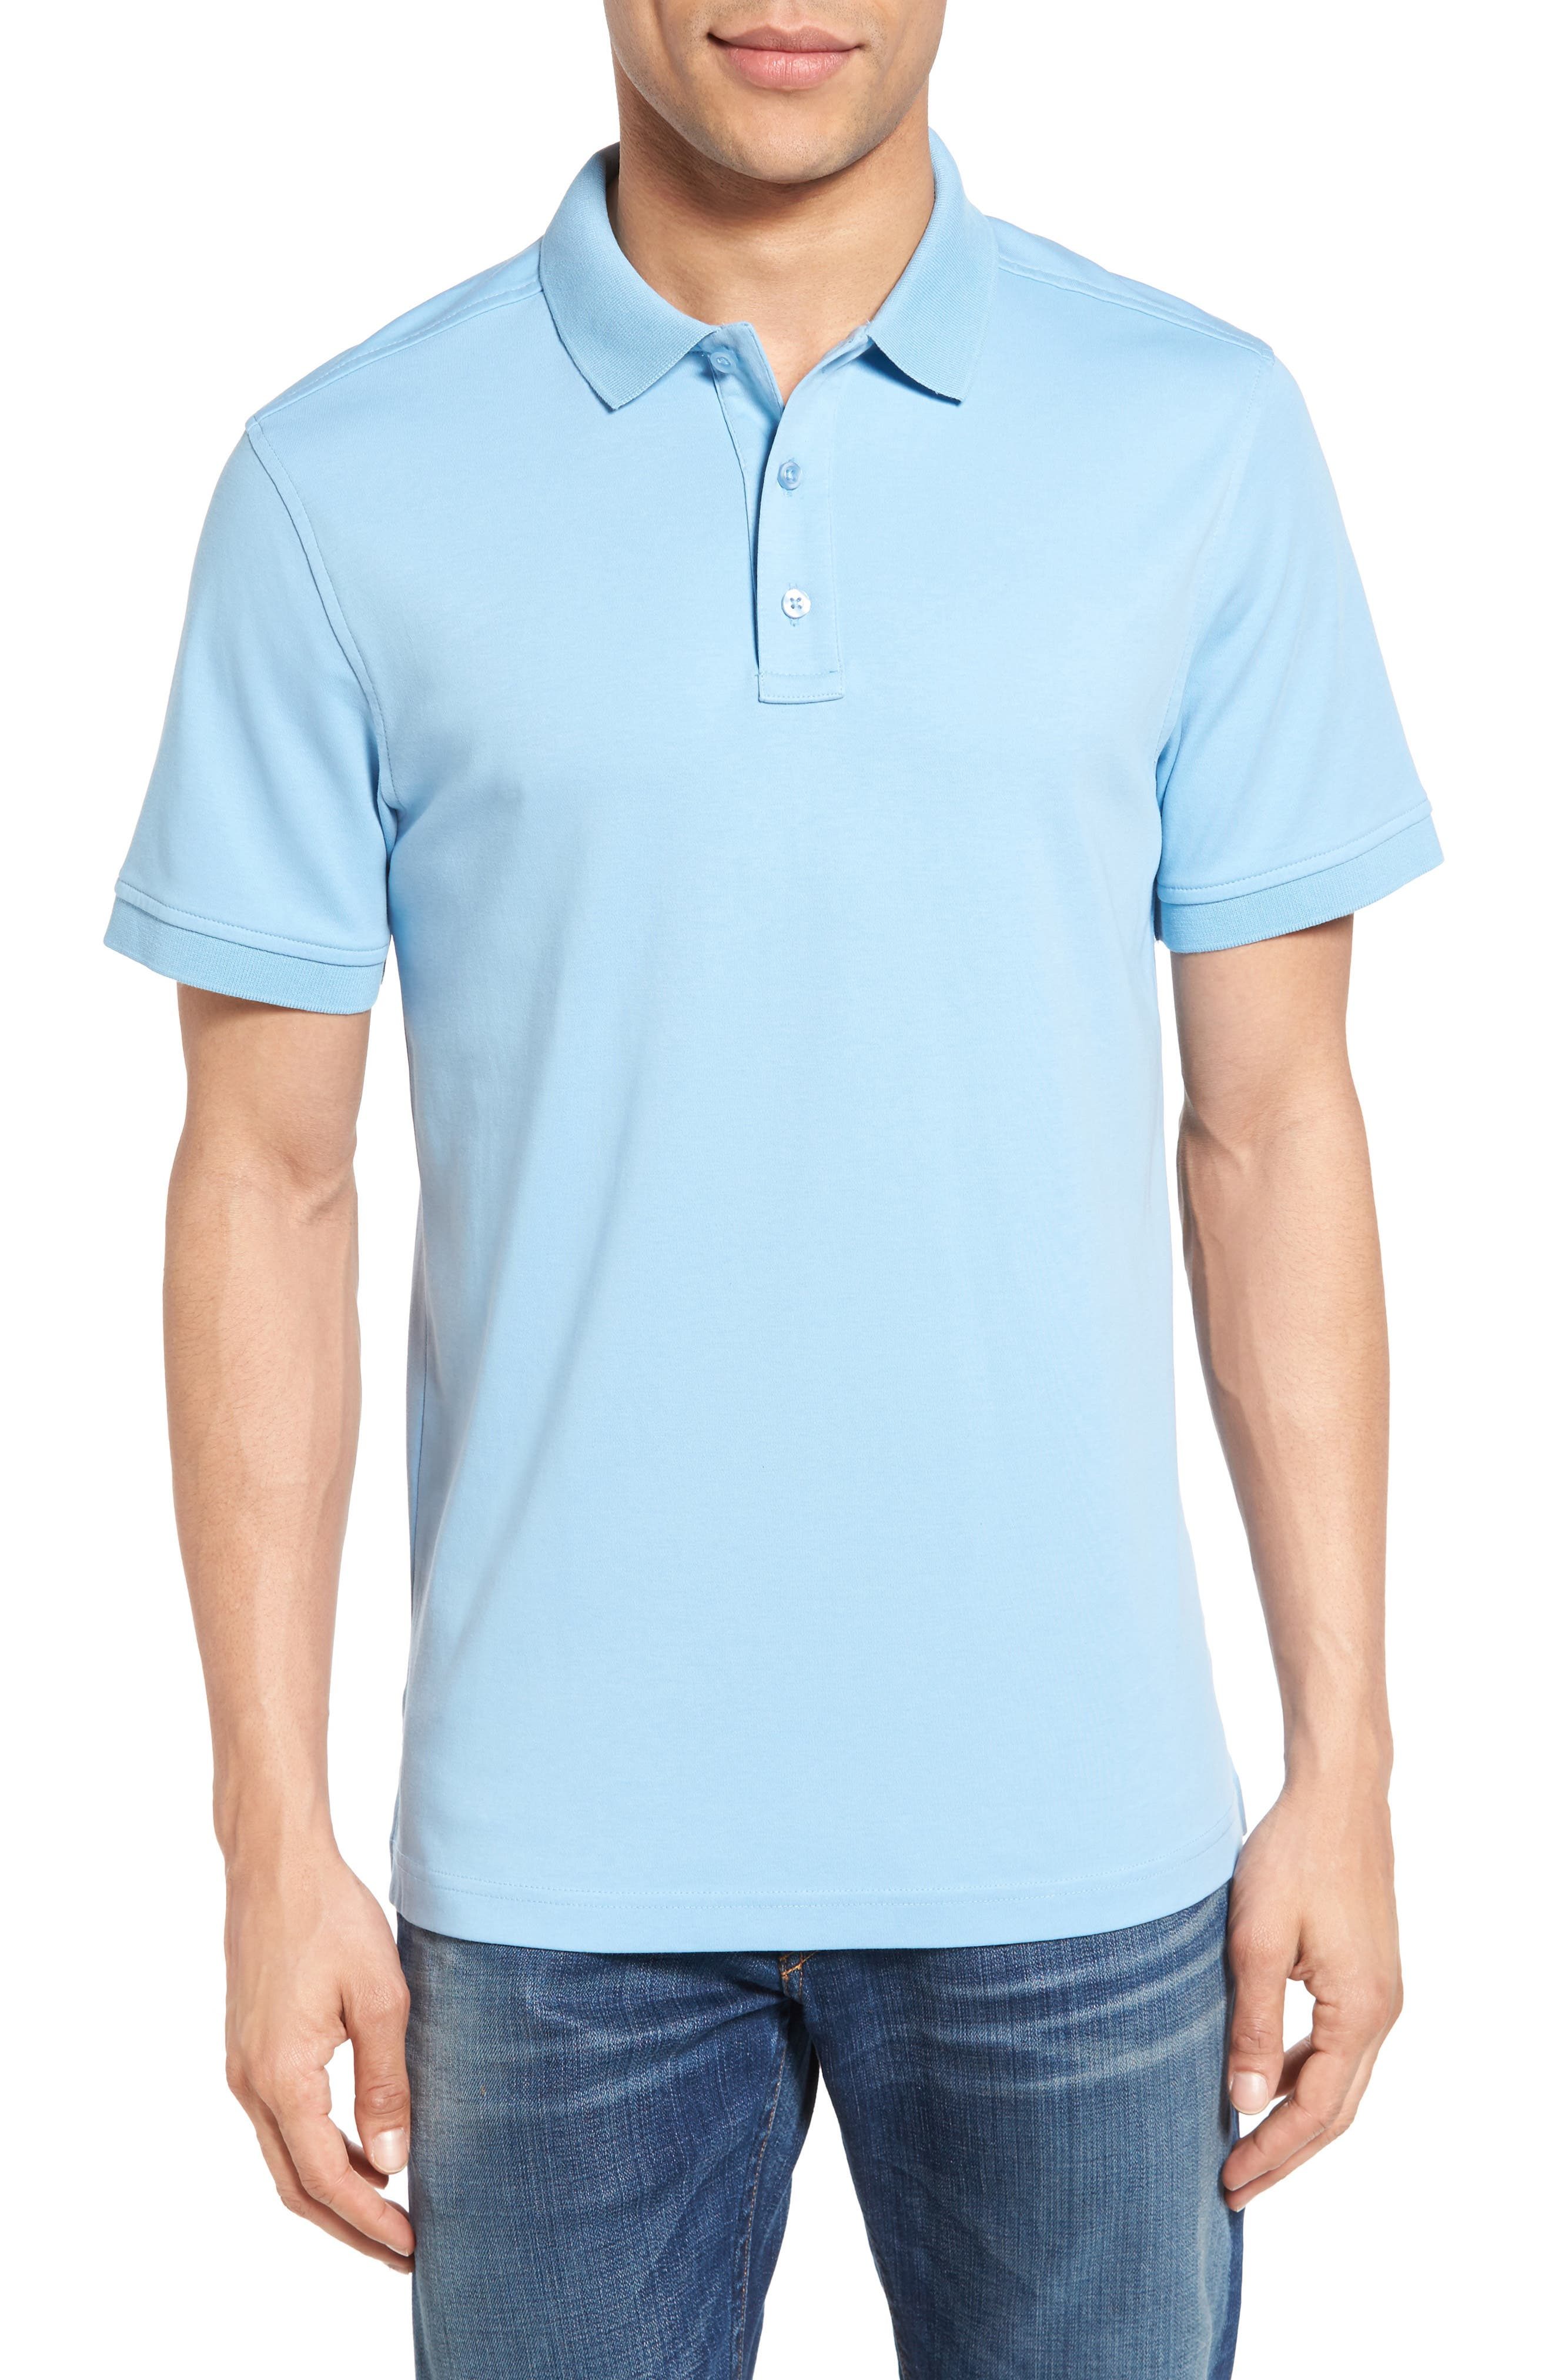 Main Image - Nordstrom Men's Shop Slim Fit Interlock Knit Polo